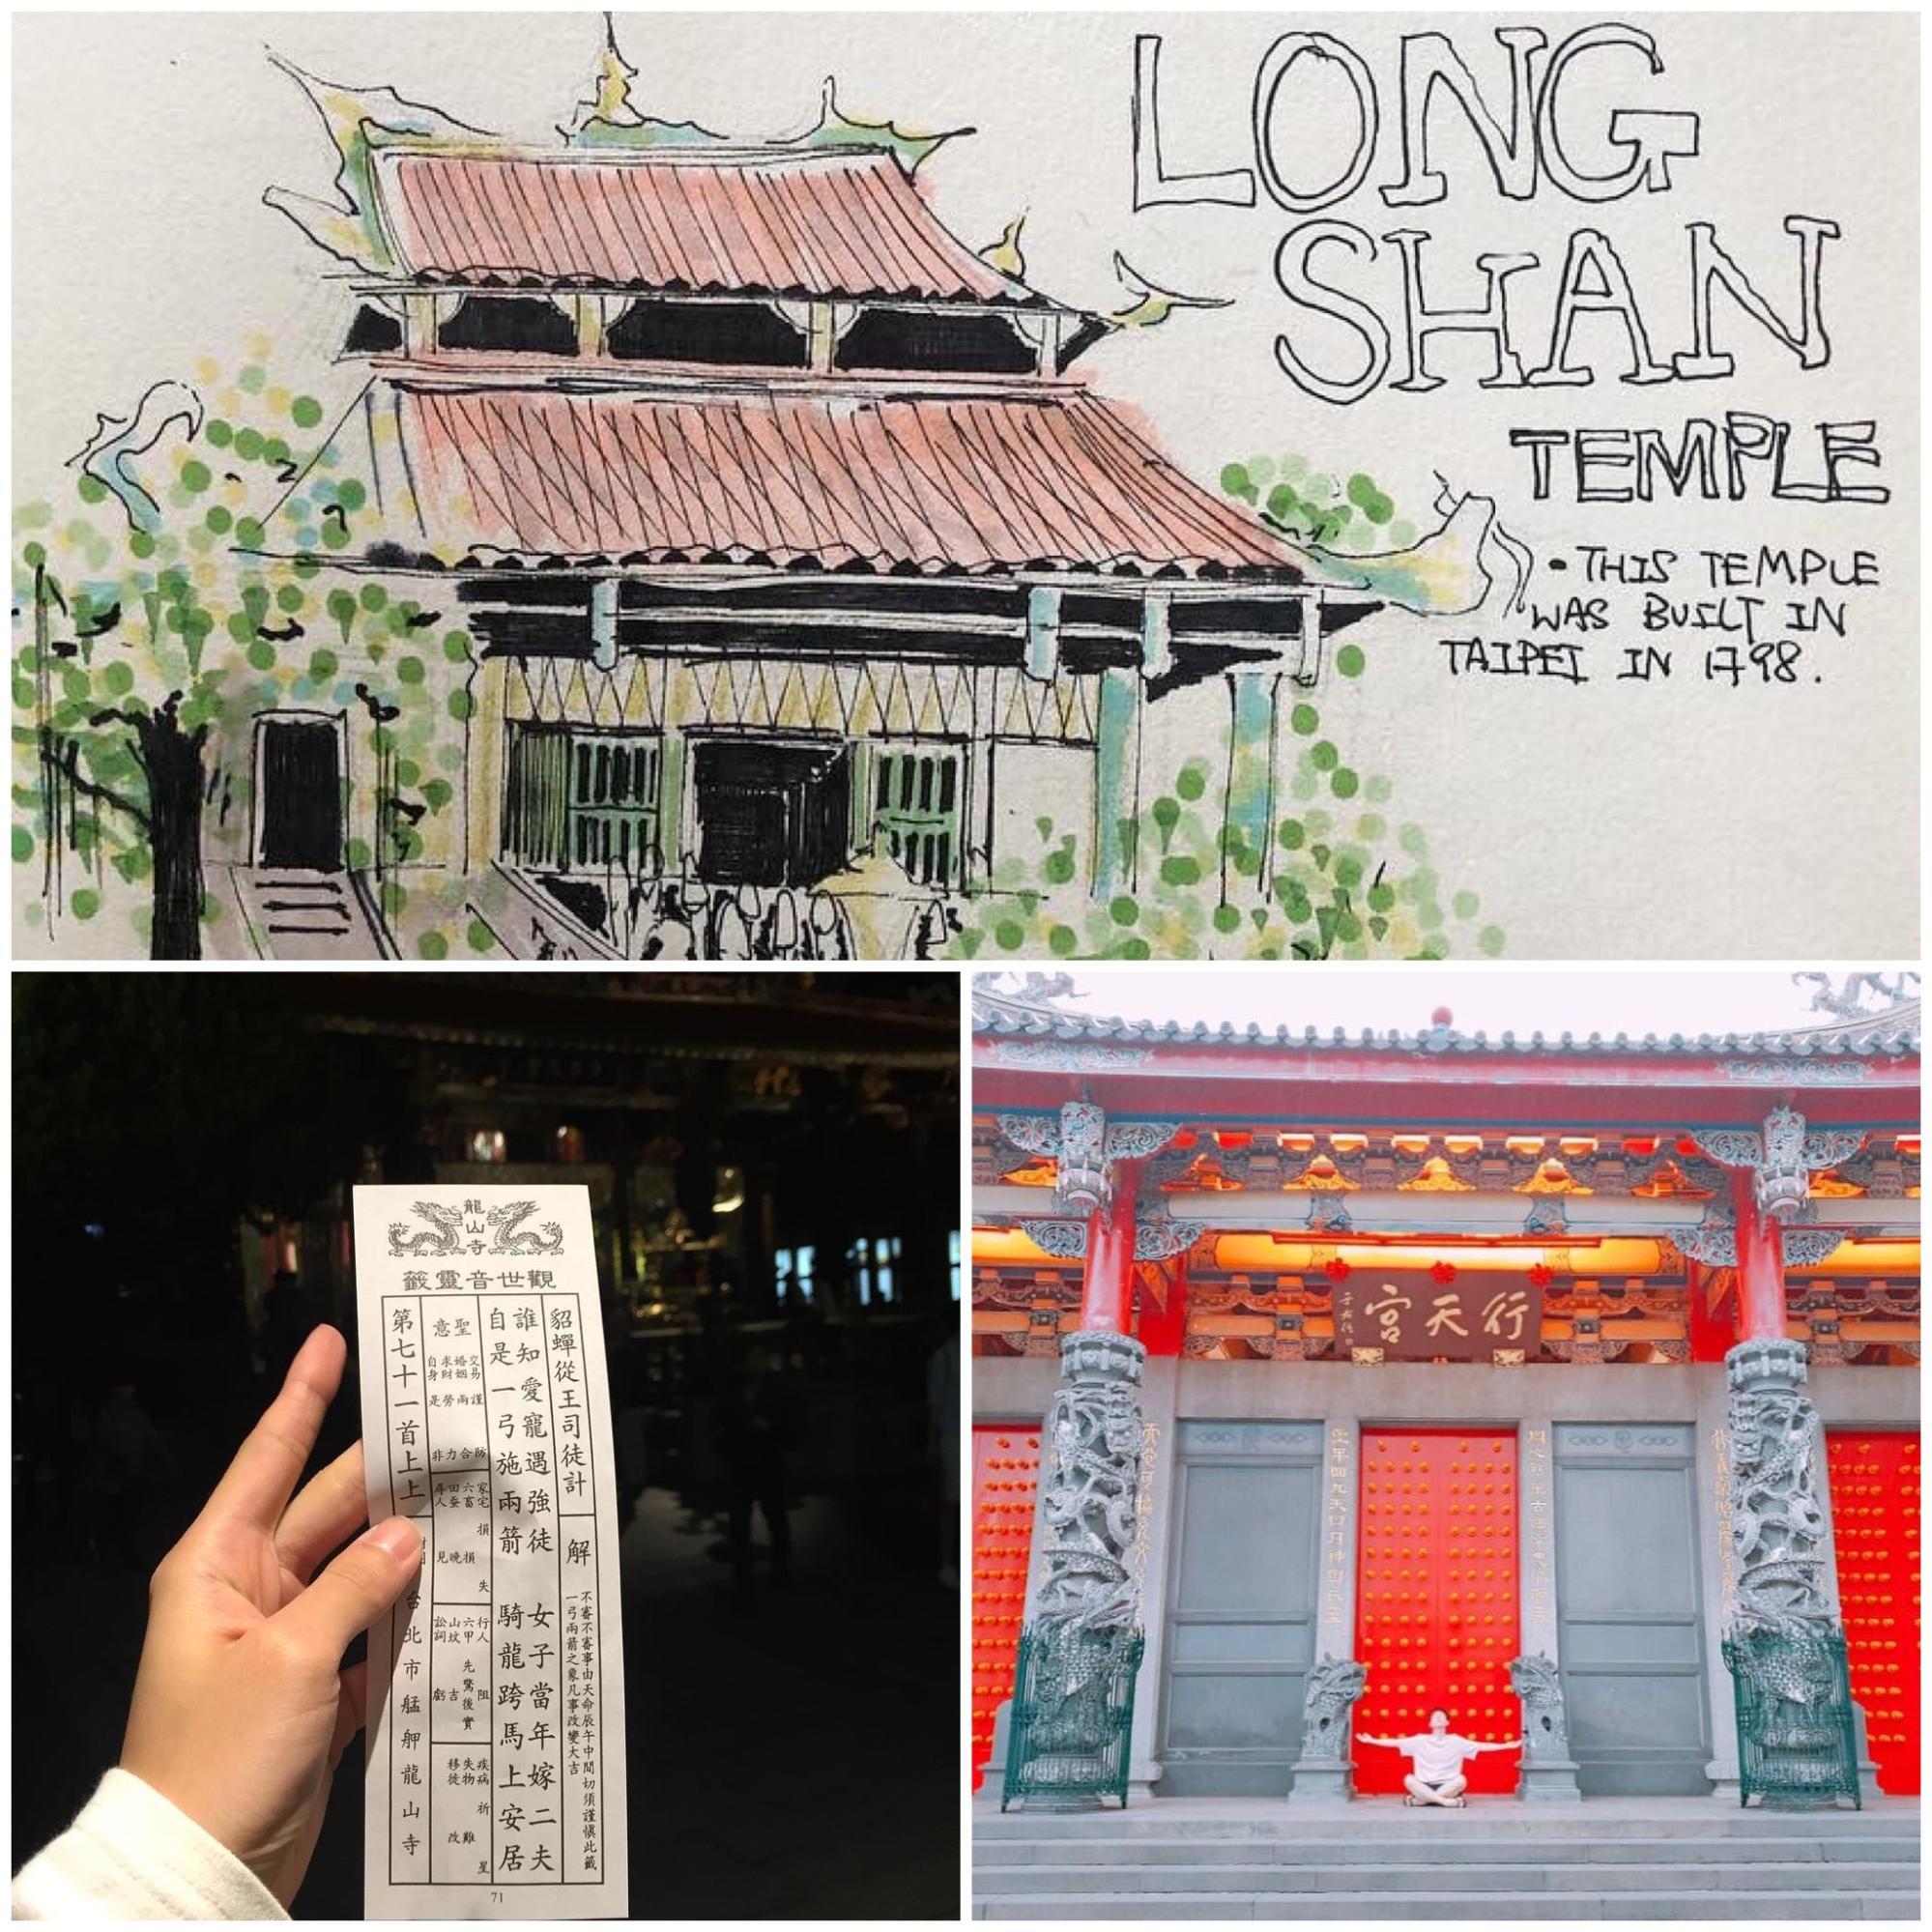 hanh trinh kham pha dai loan hon ngoc xinh dep cua chau a48